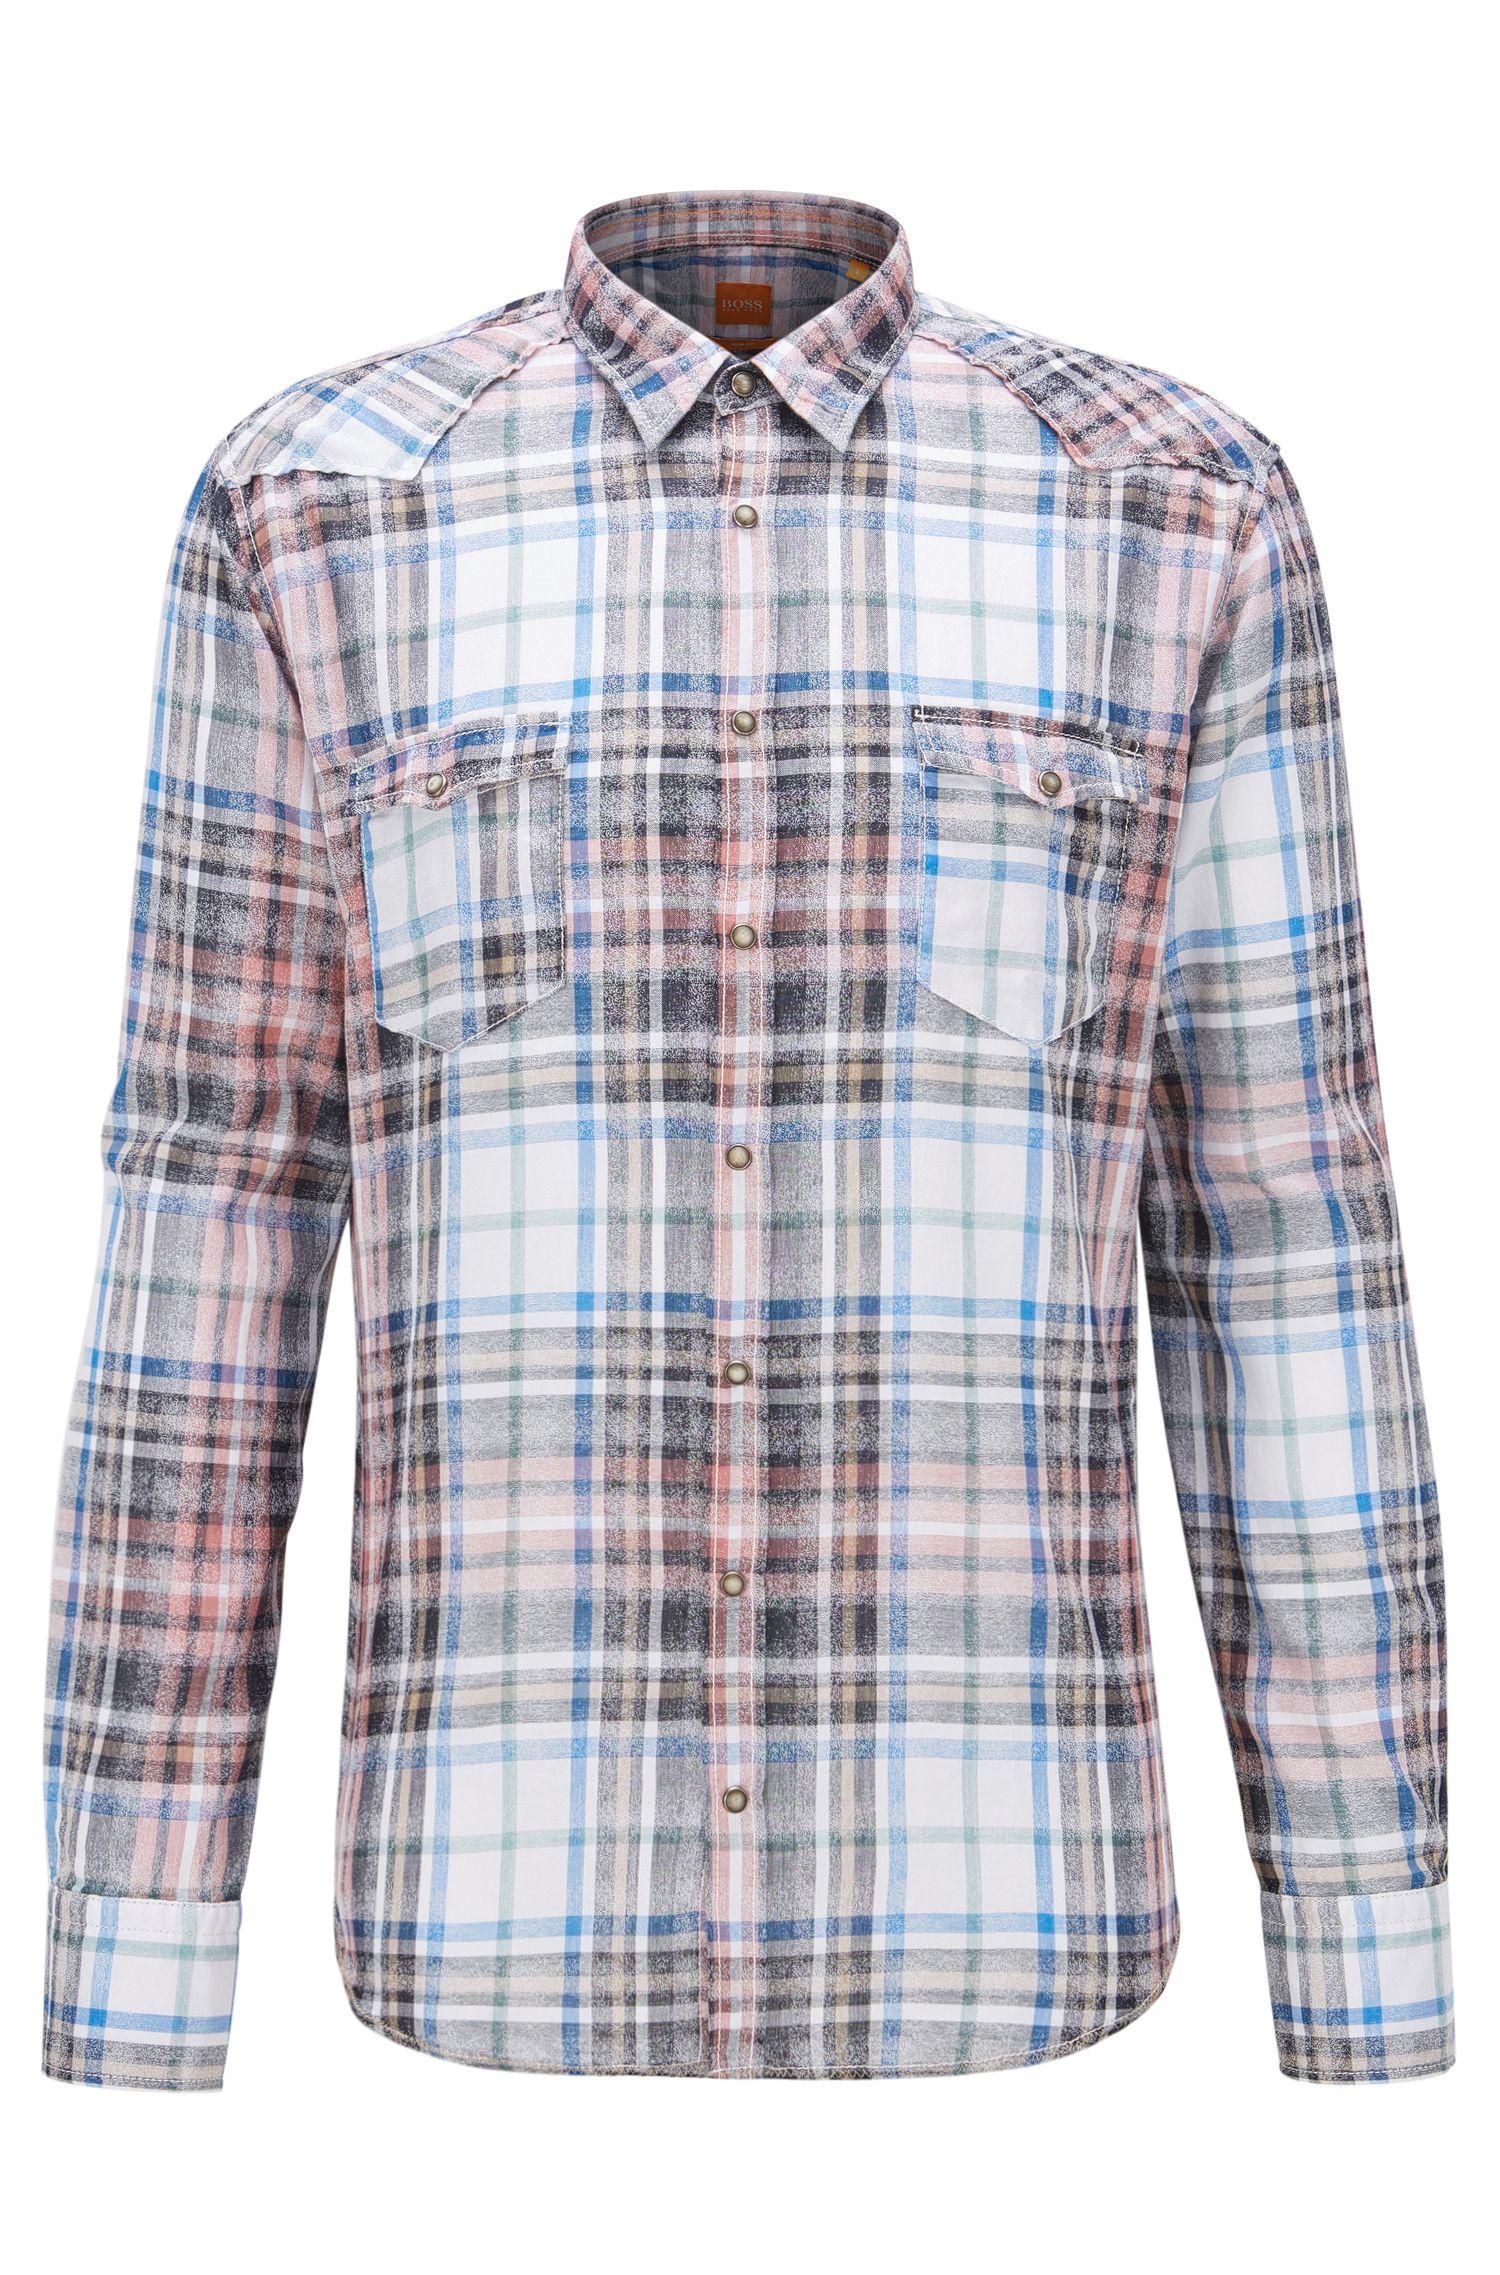 'Erodeo' | Extra-Slim Fit, Plaid Cotton Button-Down Shirt